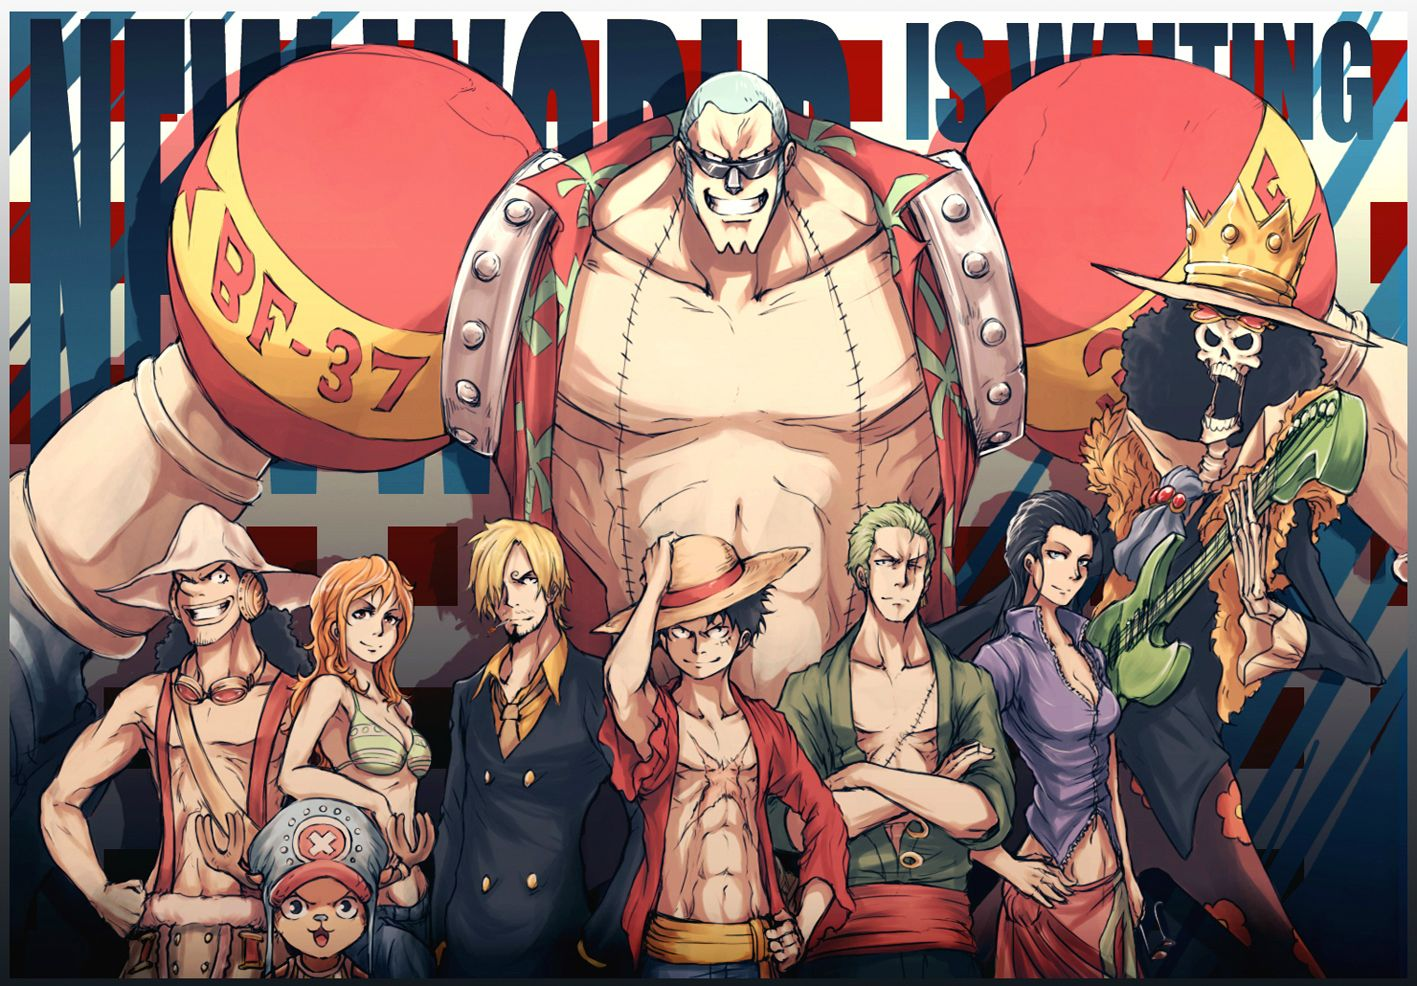 Free Download HD Wallpaper for Desktop: One Piece New ...